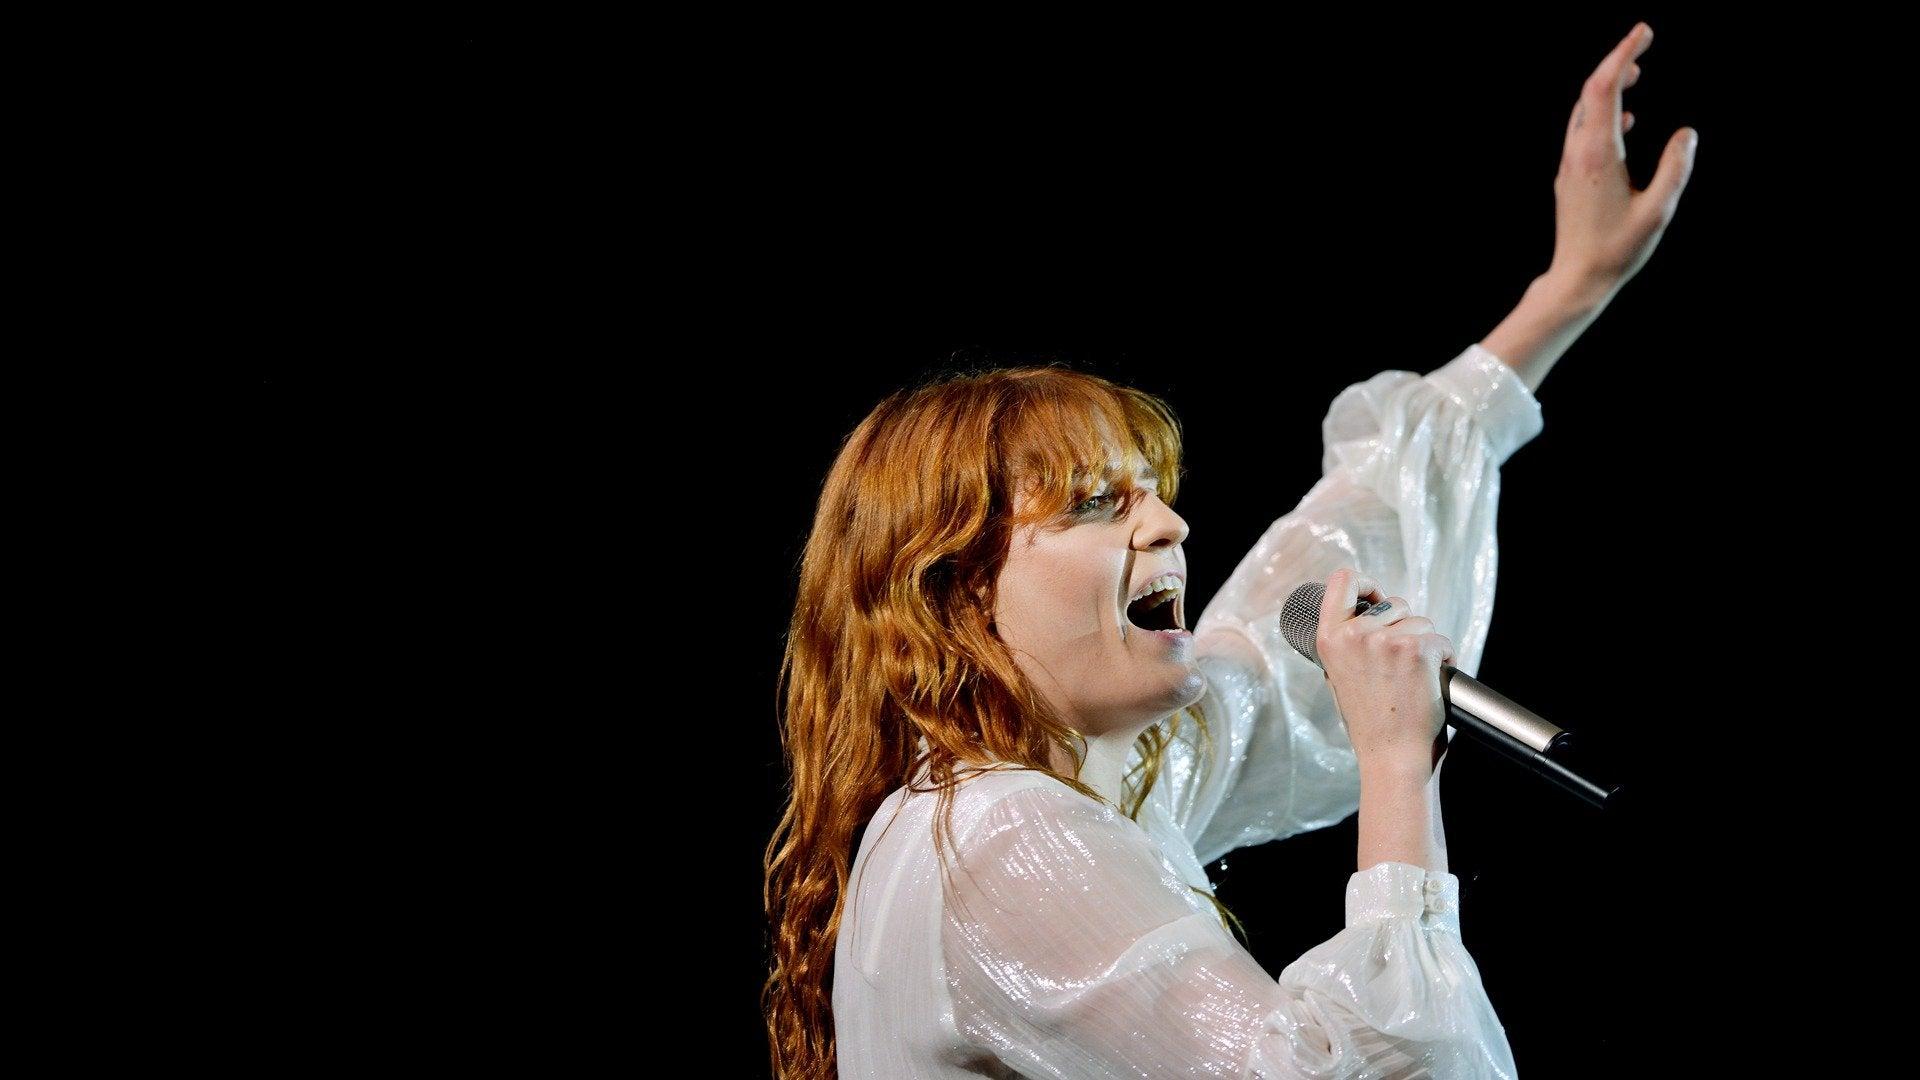 Florence & The Machine: Live at Glastonbury Festival 2015